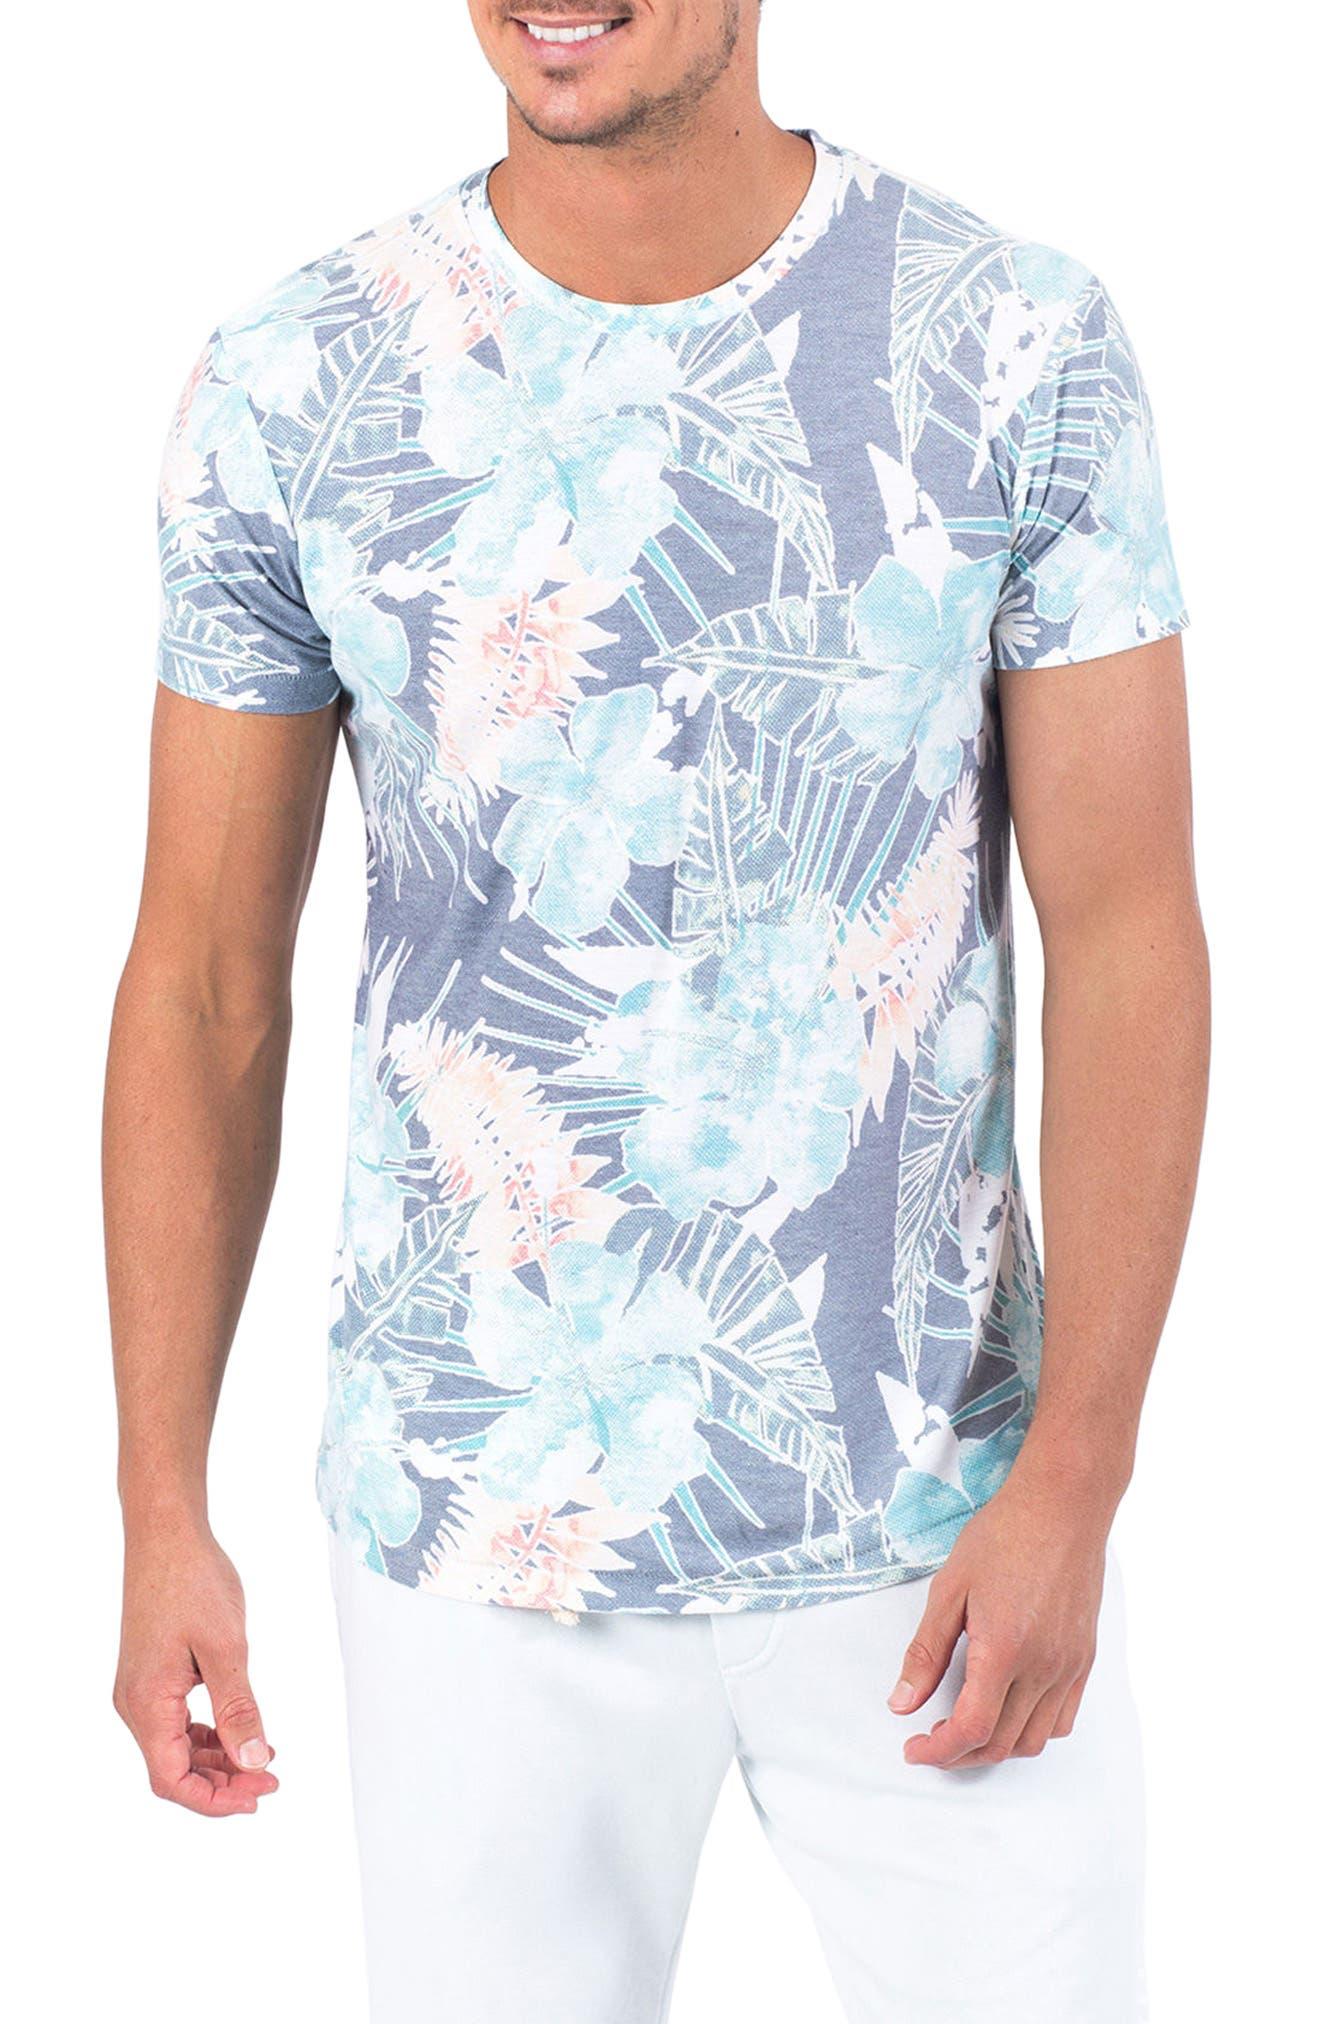 Botanica Verde T-Shirt,                         Main,                         color, 100